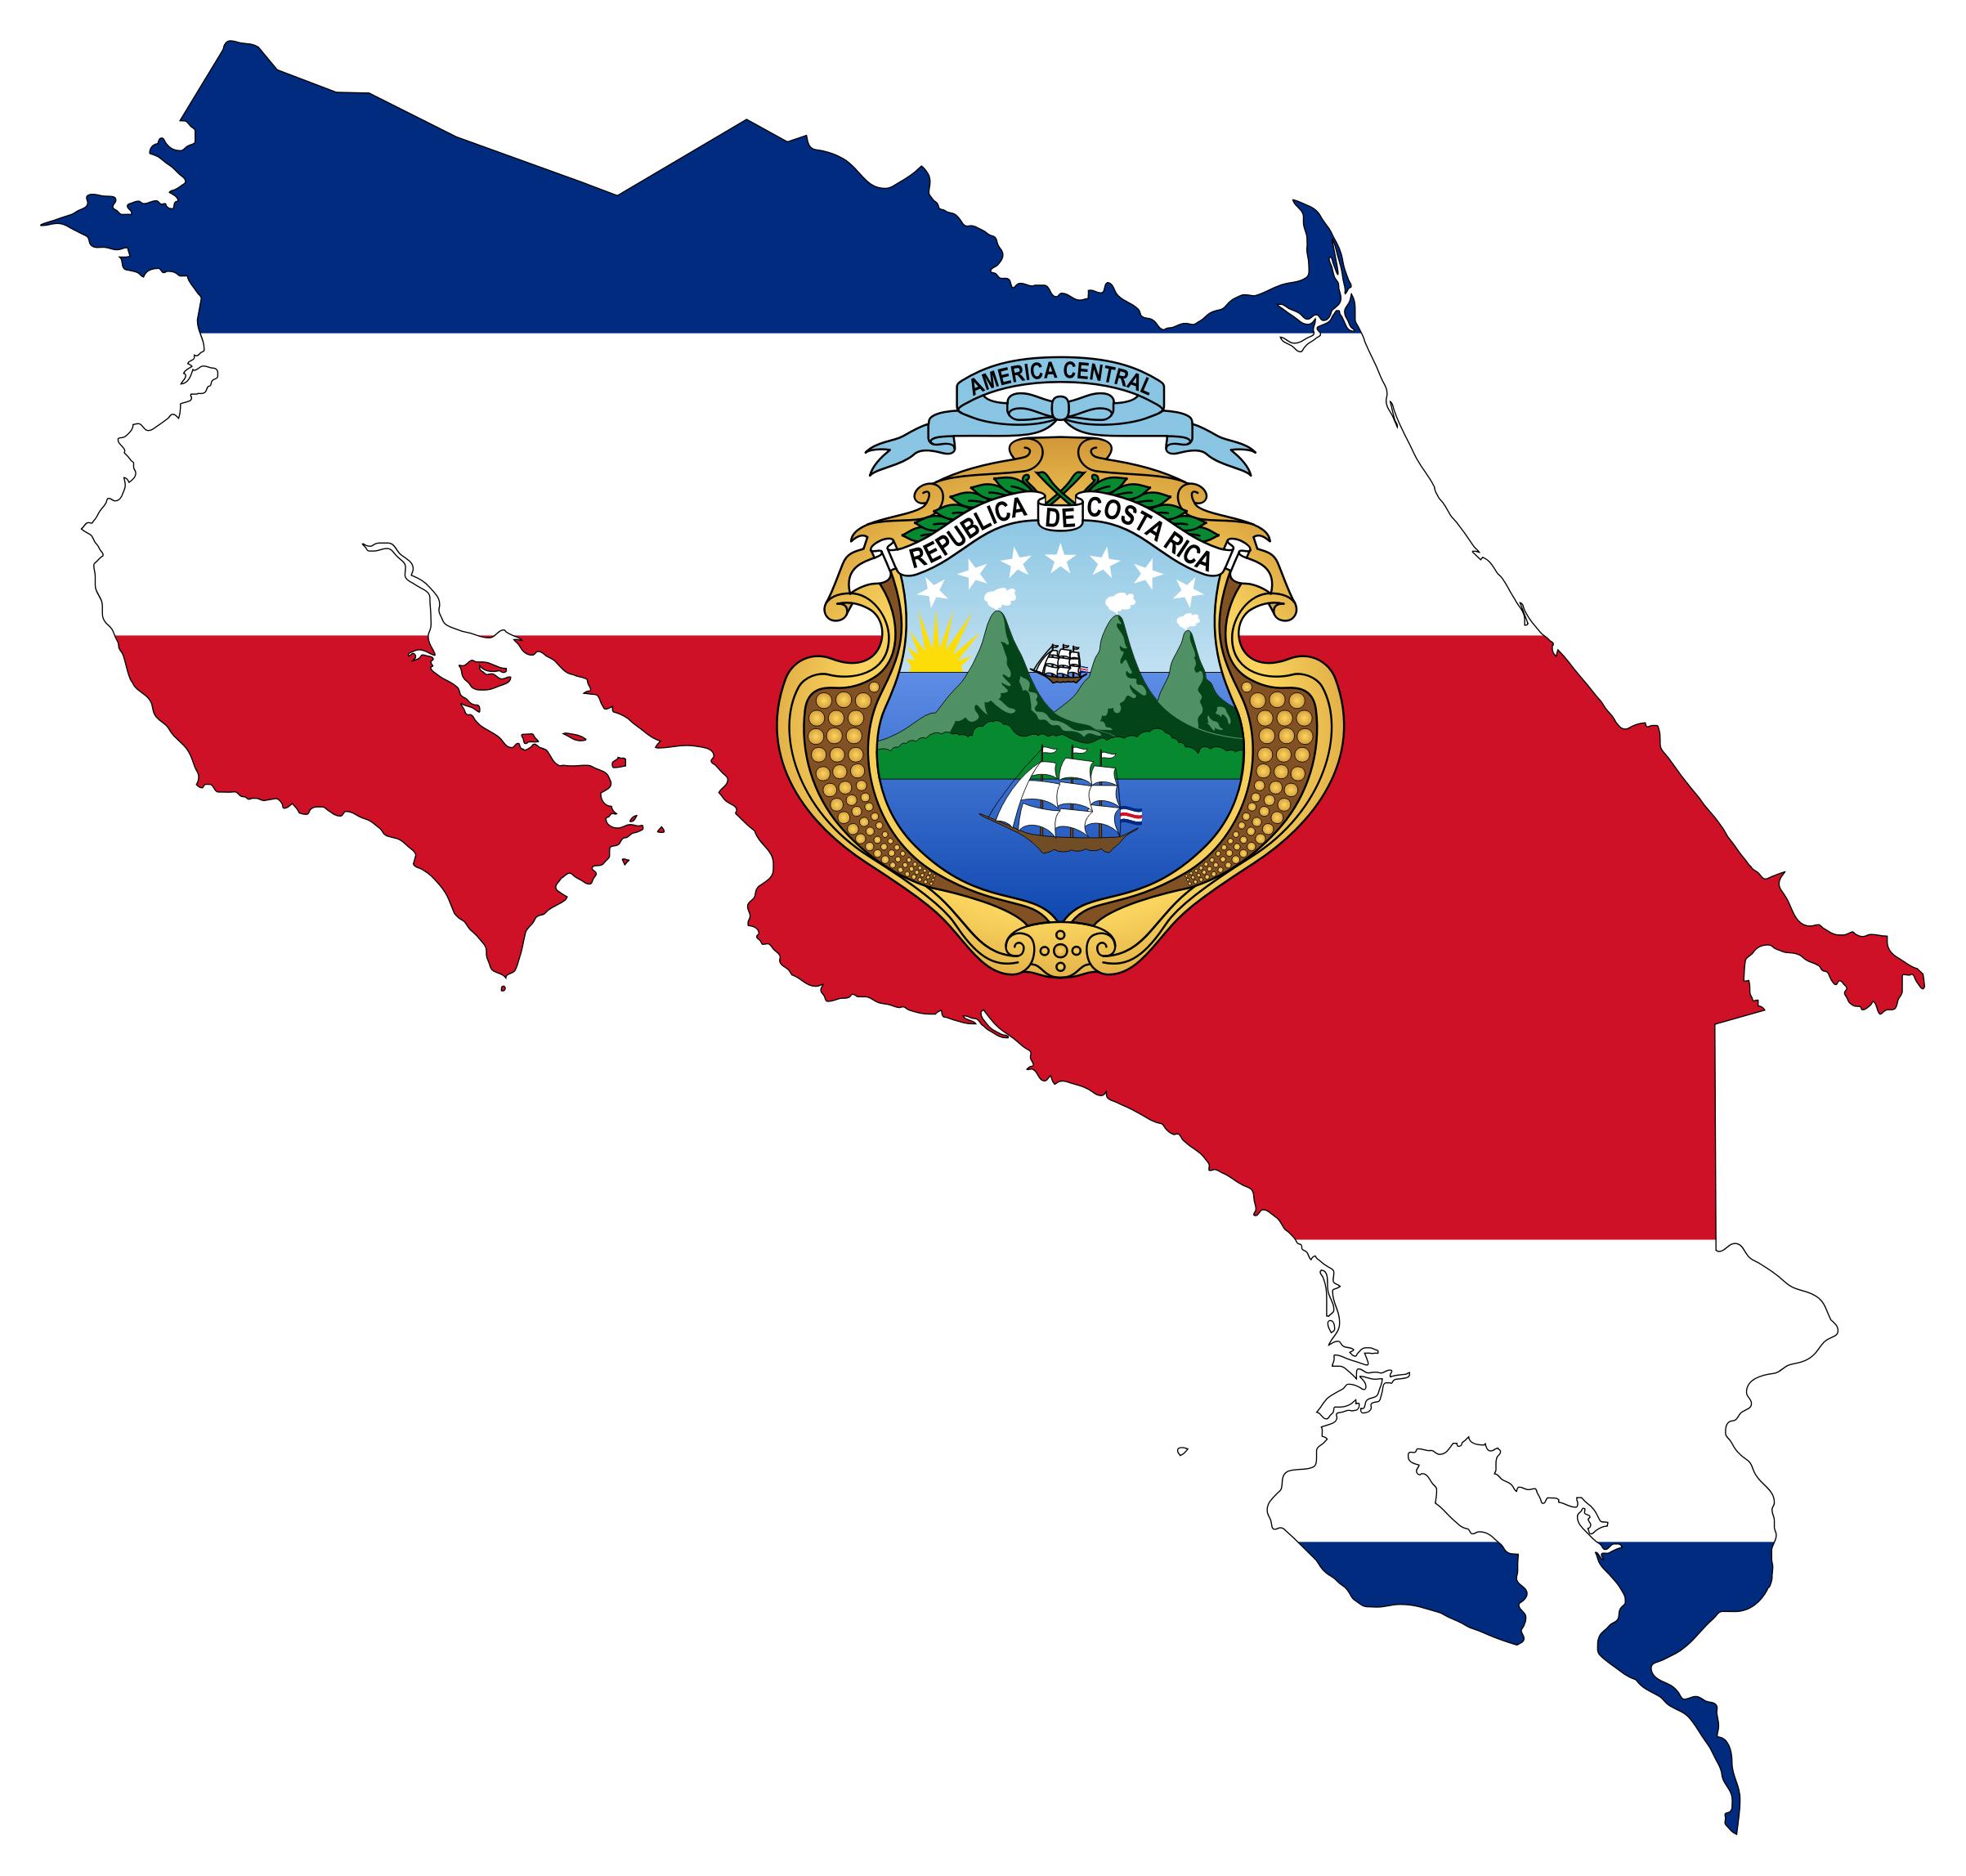 Large flag map of Costa Rica Costa Rica North America